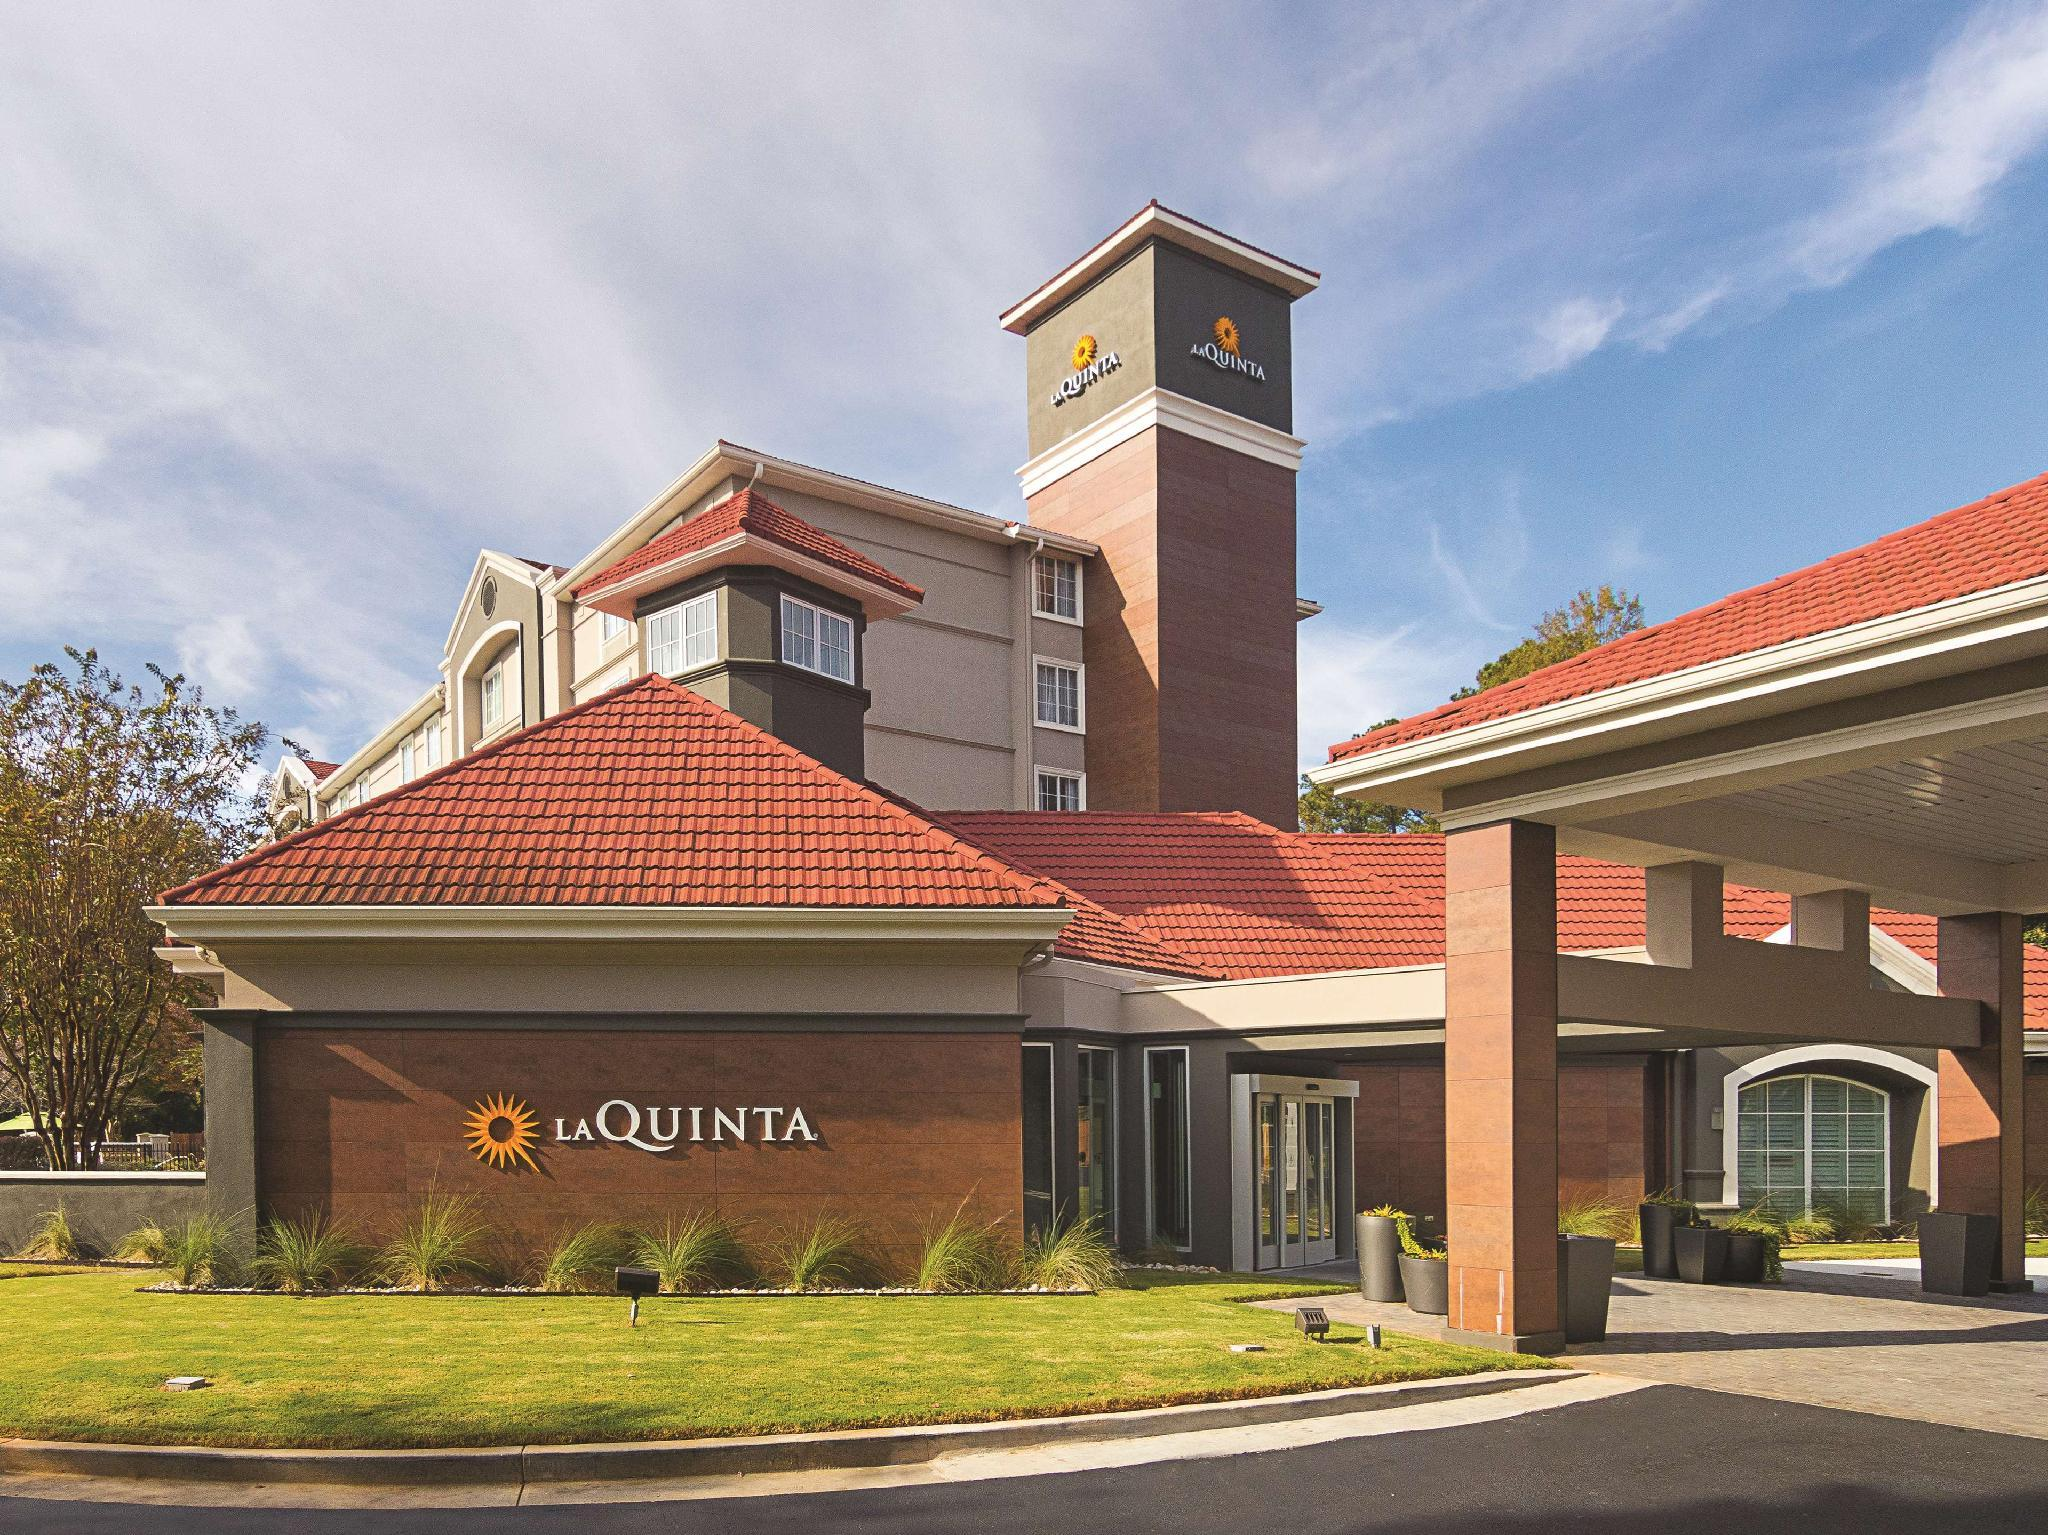 La Quinta Inn And Suites By Wyndham Atlanta Conyers